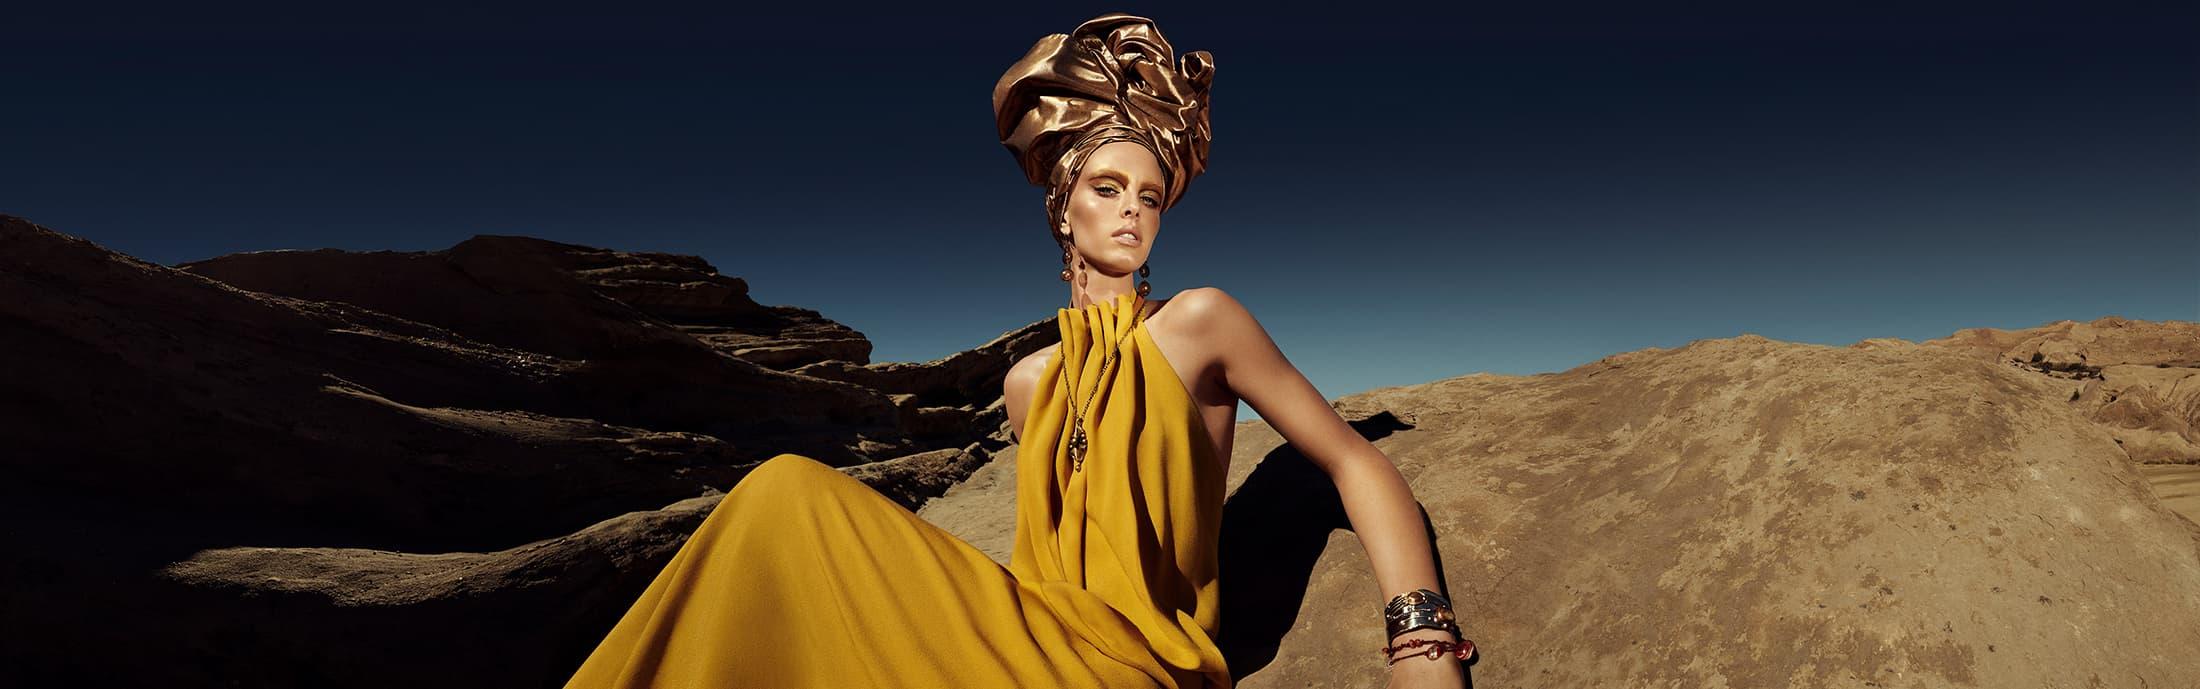 Zara Spring 2021 Ad Campaign Film & Photos